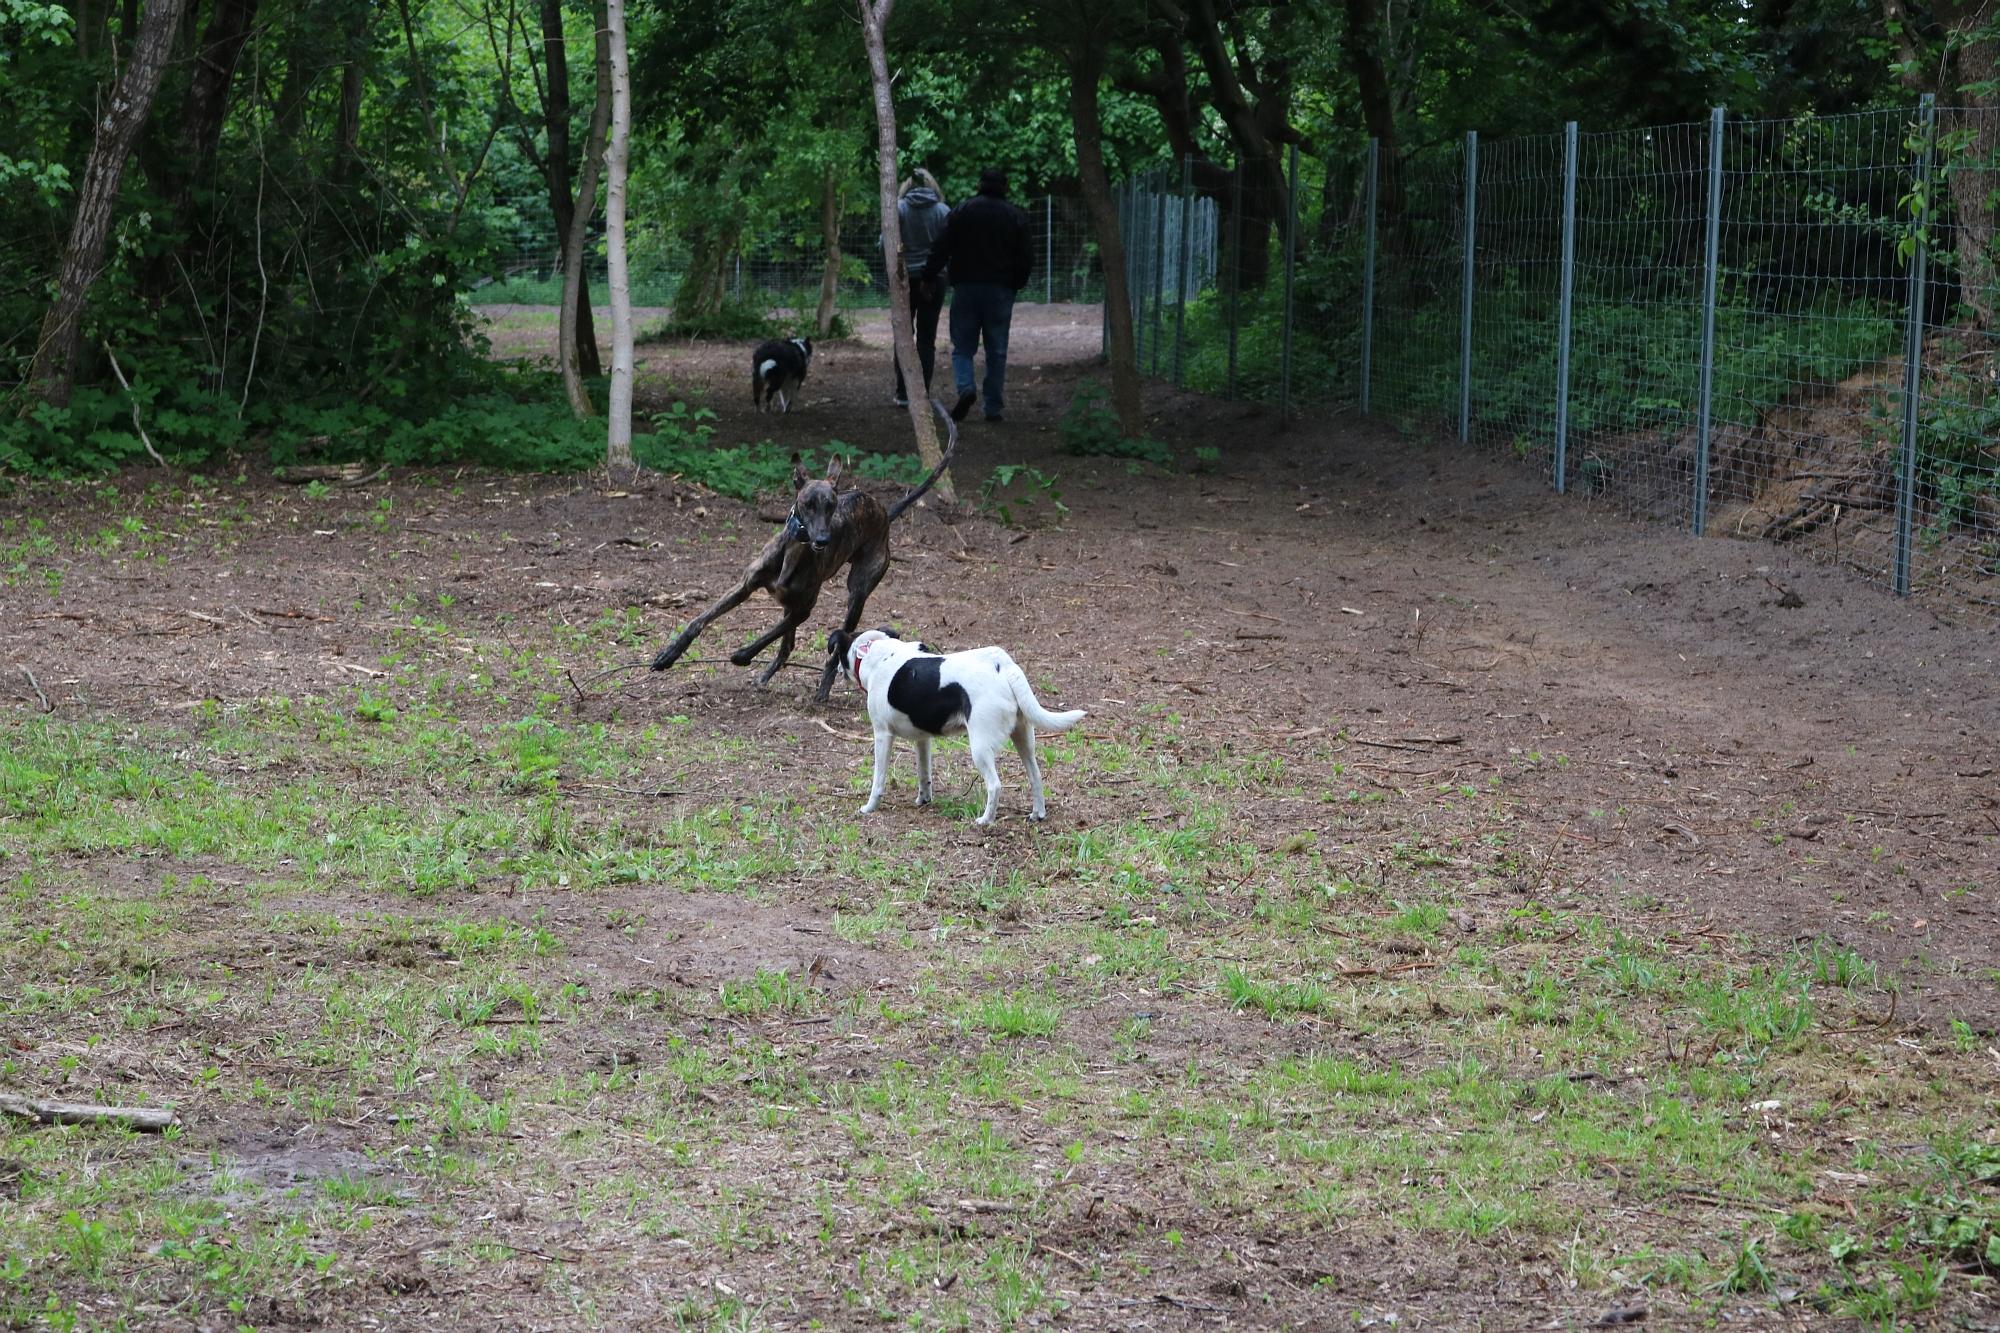 20200522 Hundefreilauf Sylter Weg 3